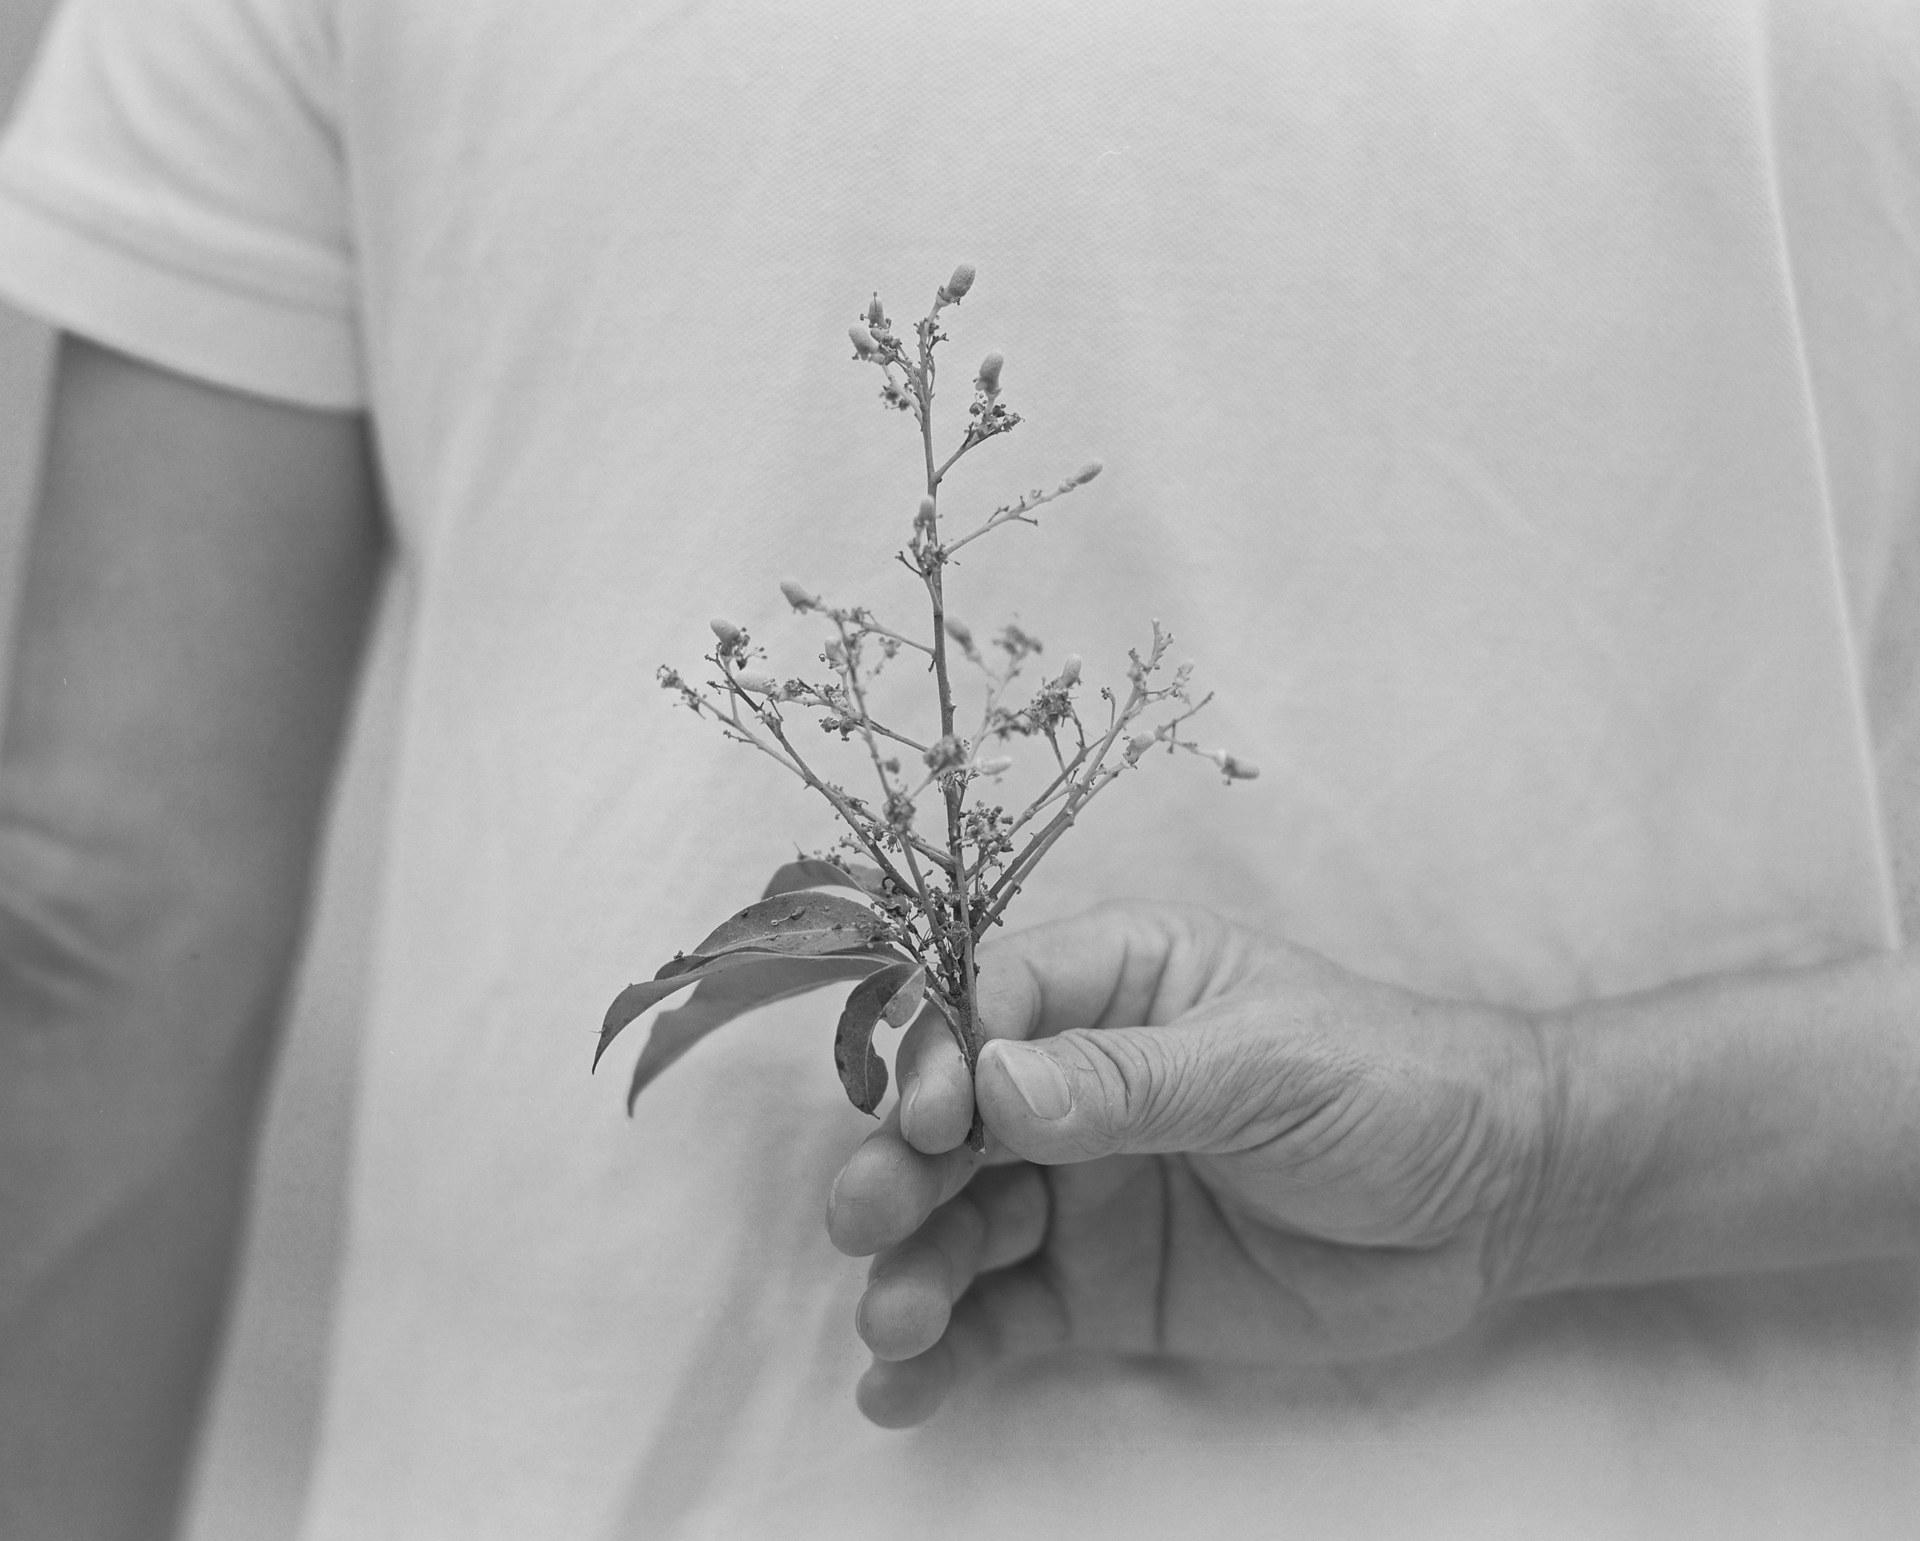 Lychee flower#2, 2021